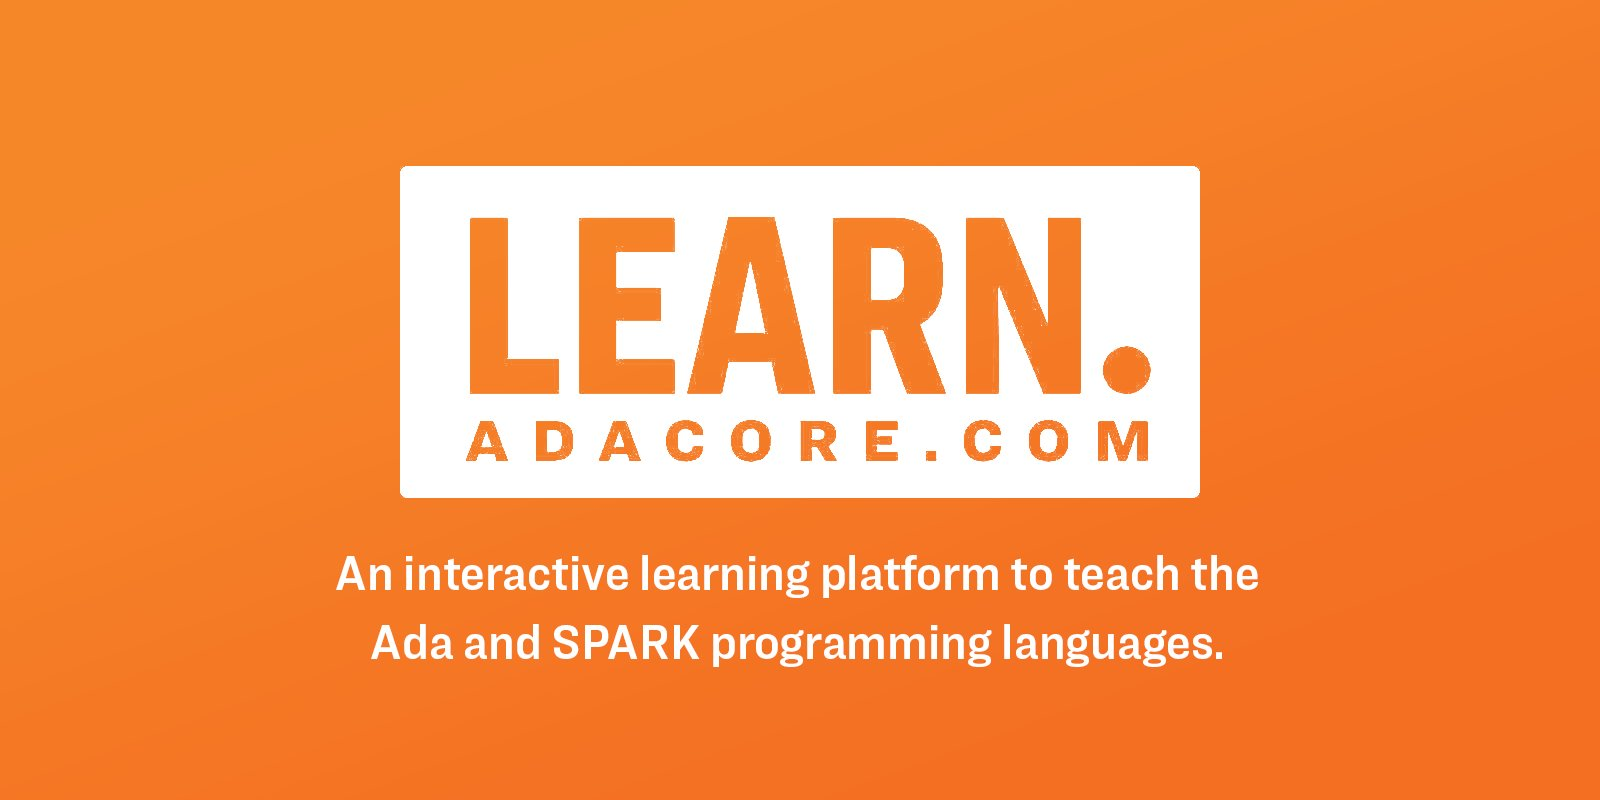 learn.adacore.com